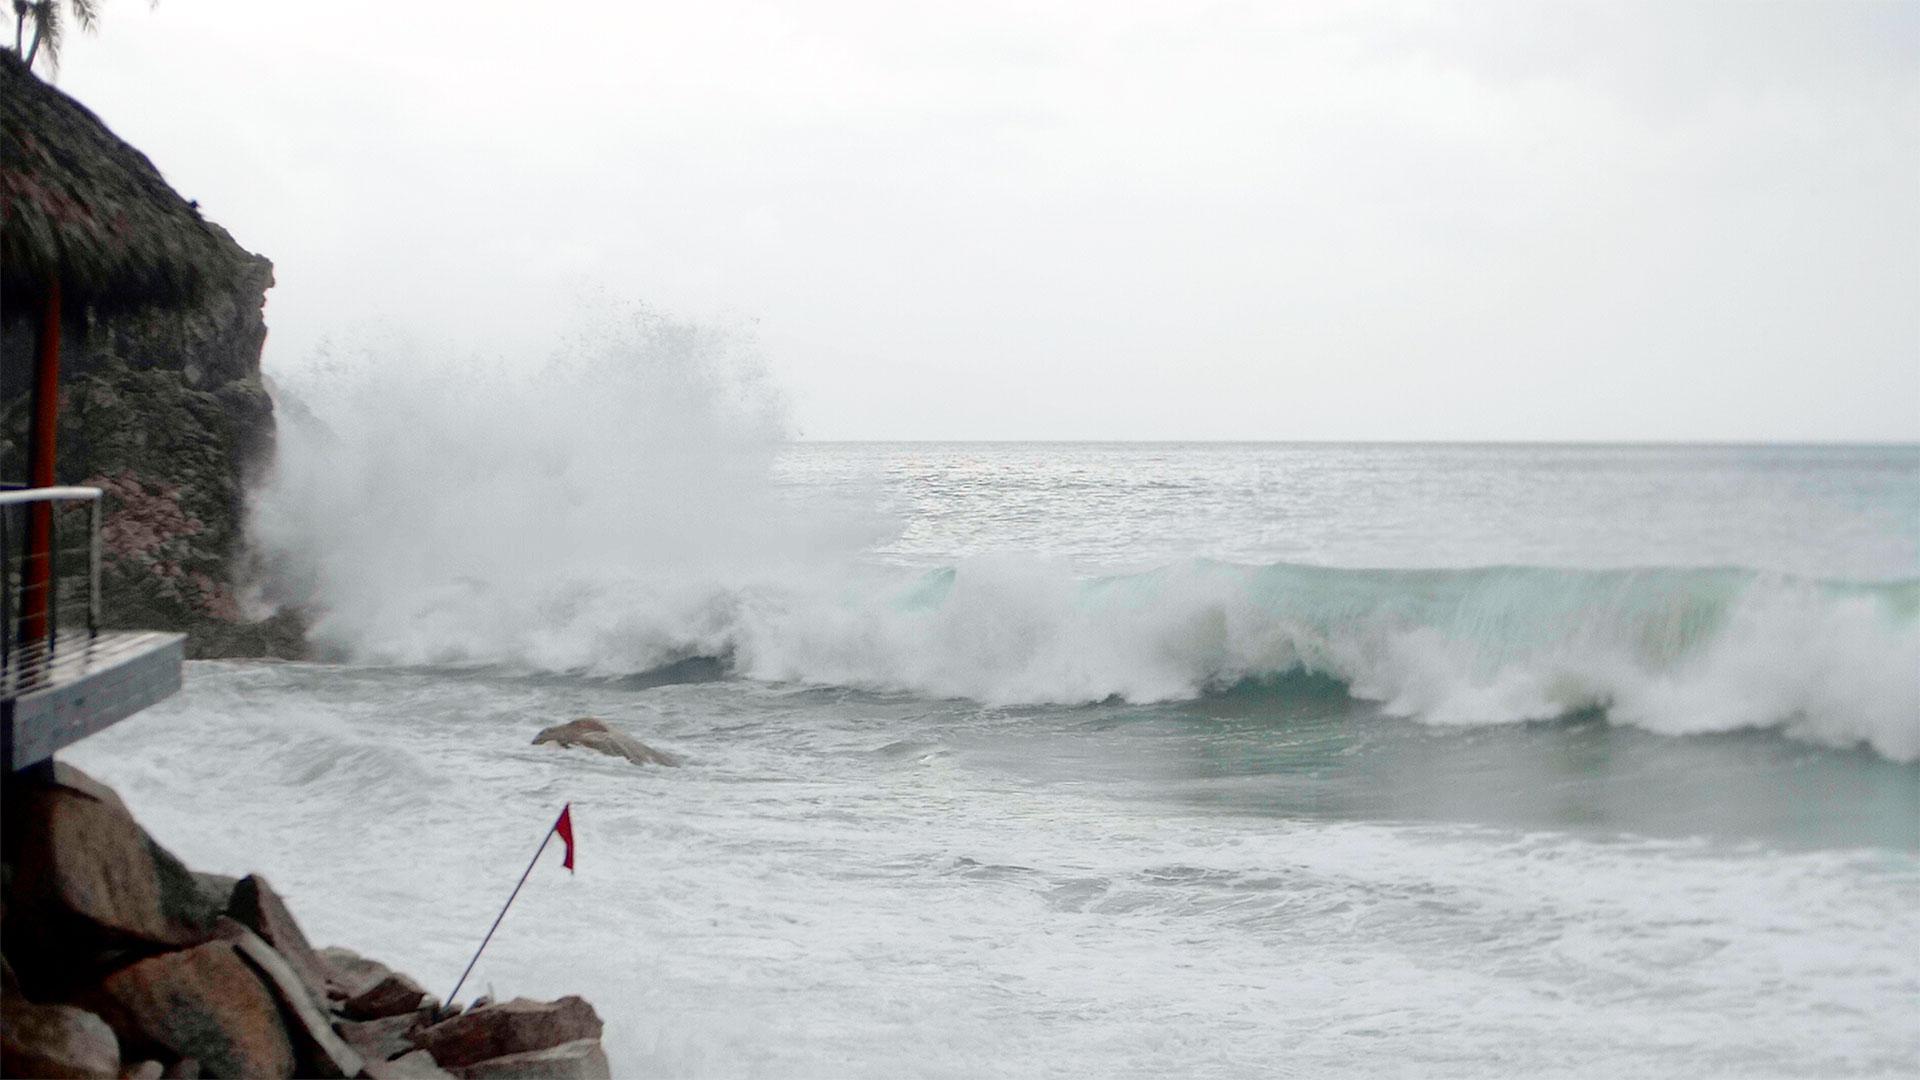 Waves Crash during Hurricane Willa at the Hyatt Ziva Puerto Vallarta